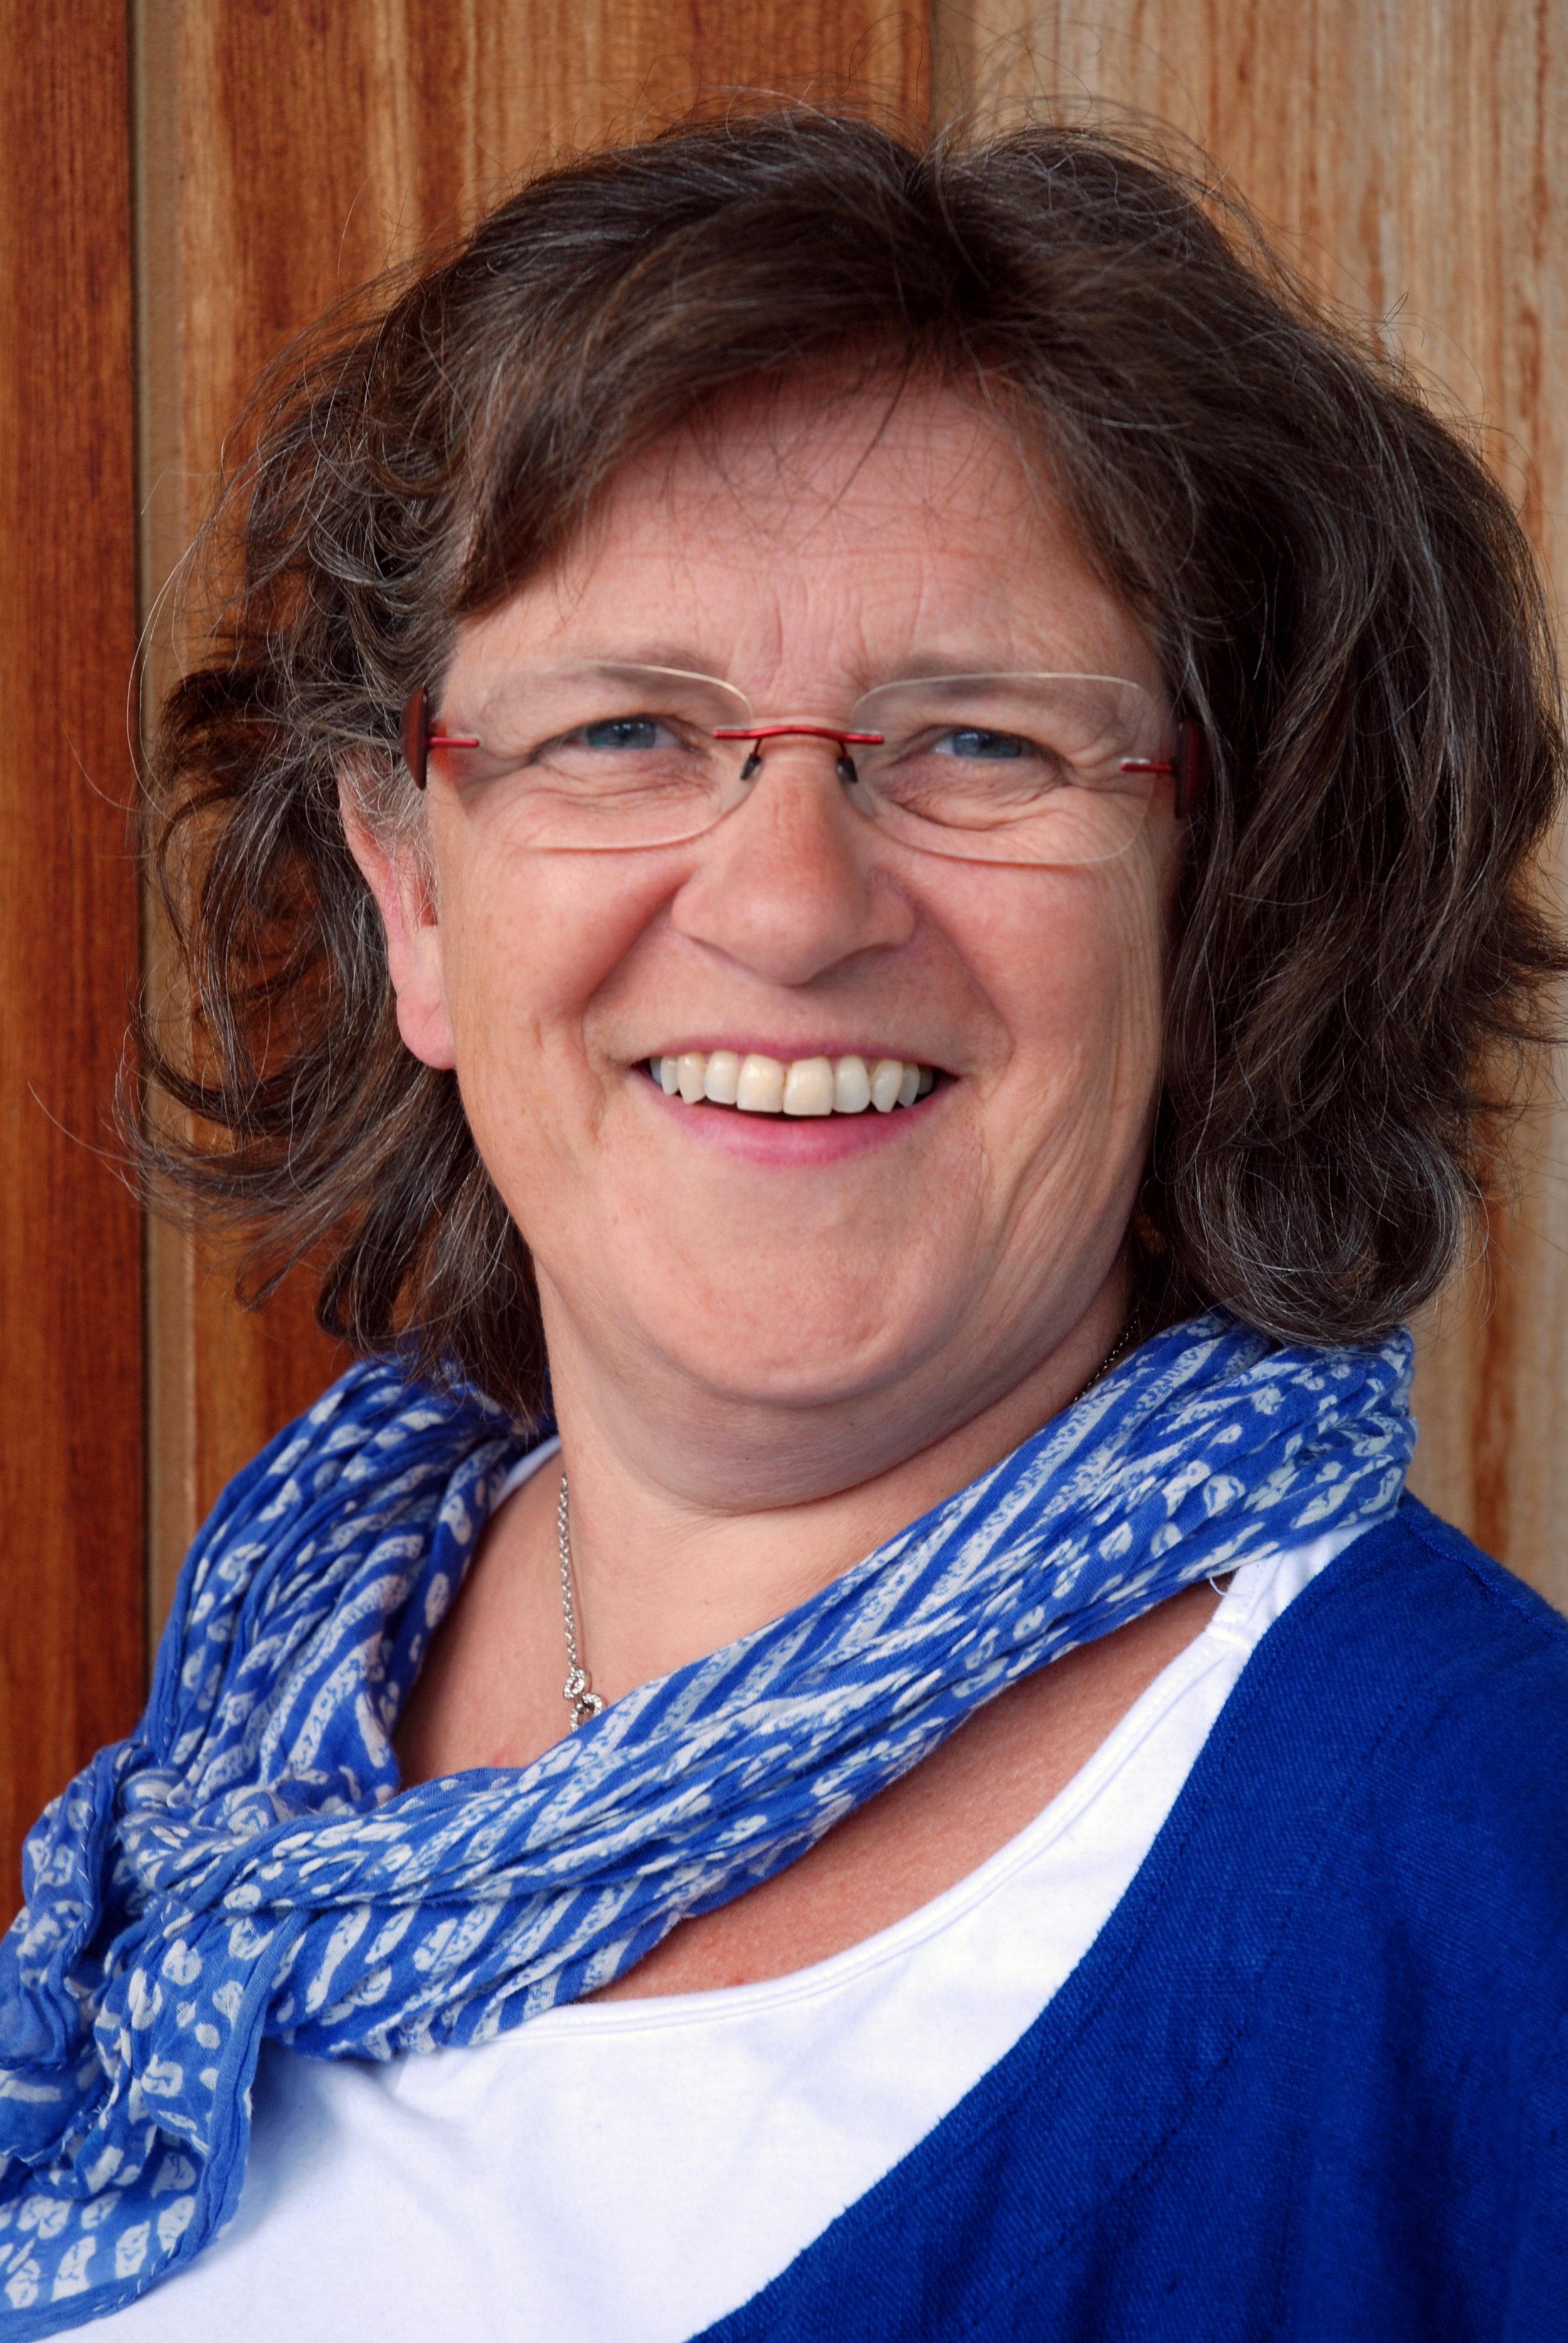 Hanne B. Oftedal (Sandane)